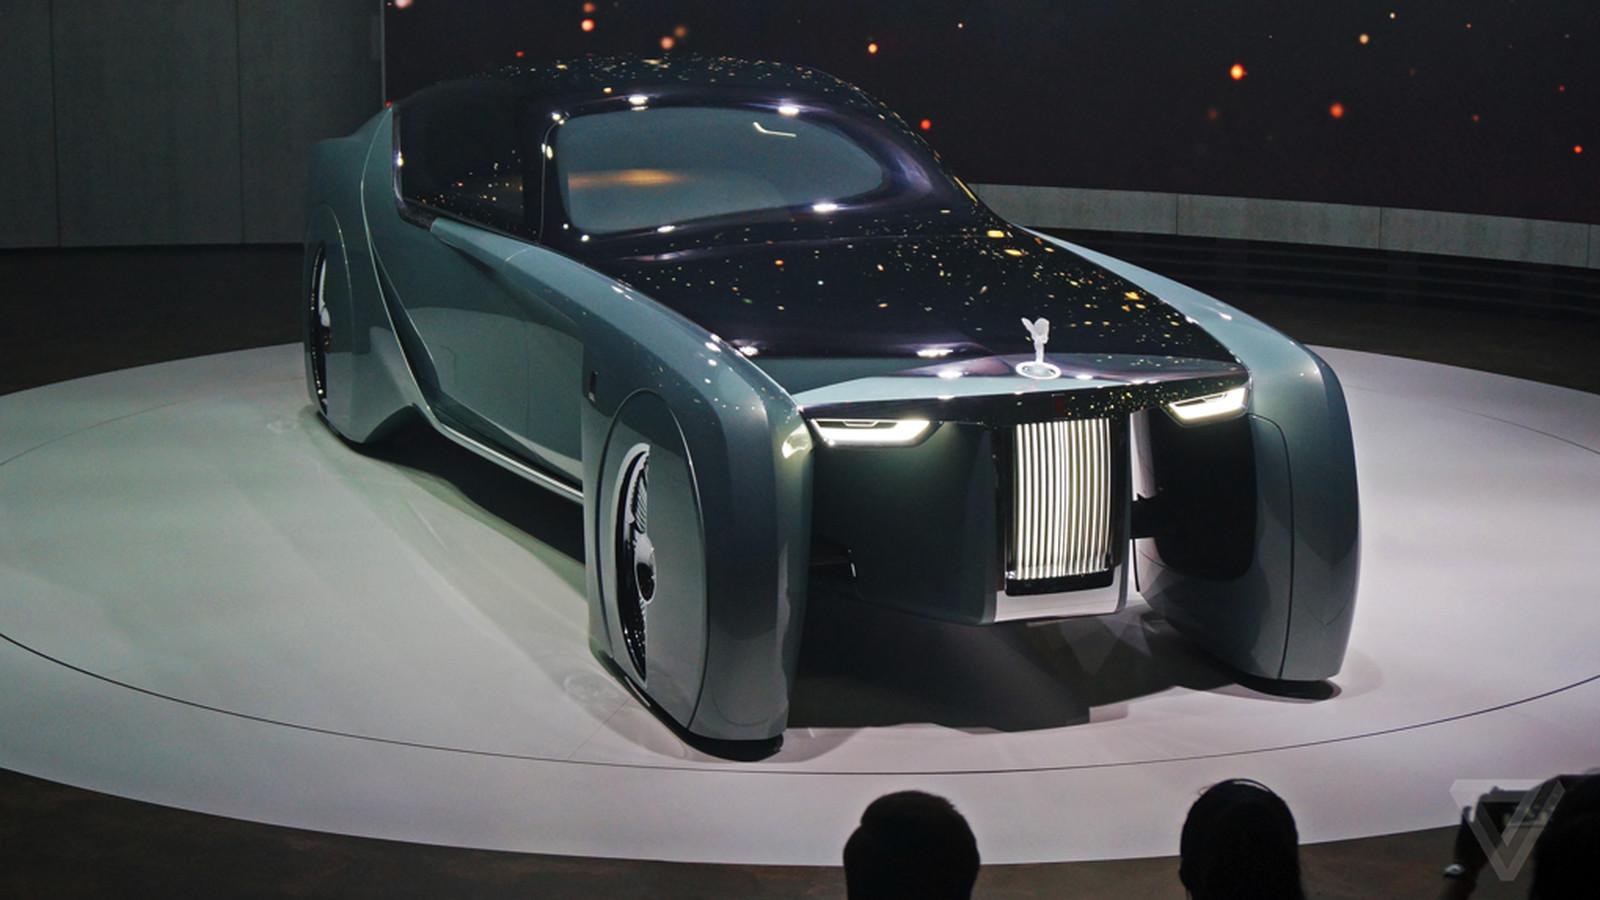 Samsung Wallpaper Hd 1080p 2017 Get Inside Rolls Royce S Unbelievable Vision 100 Concept